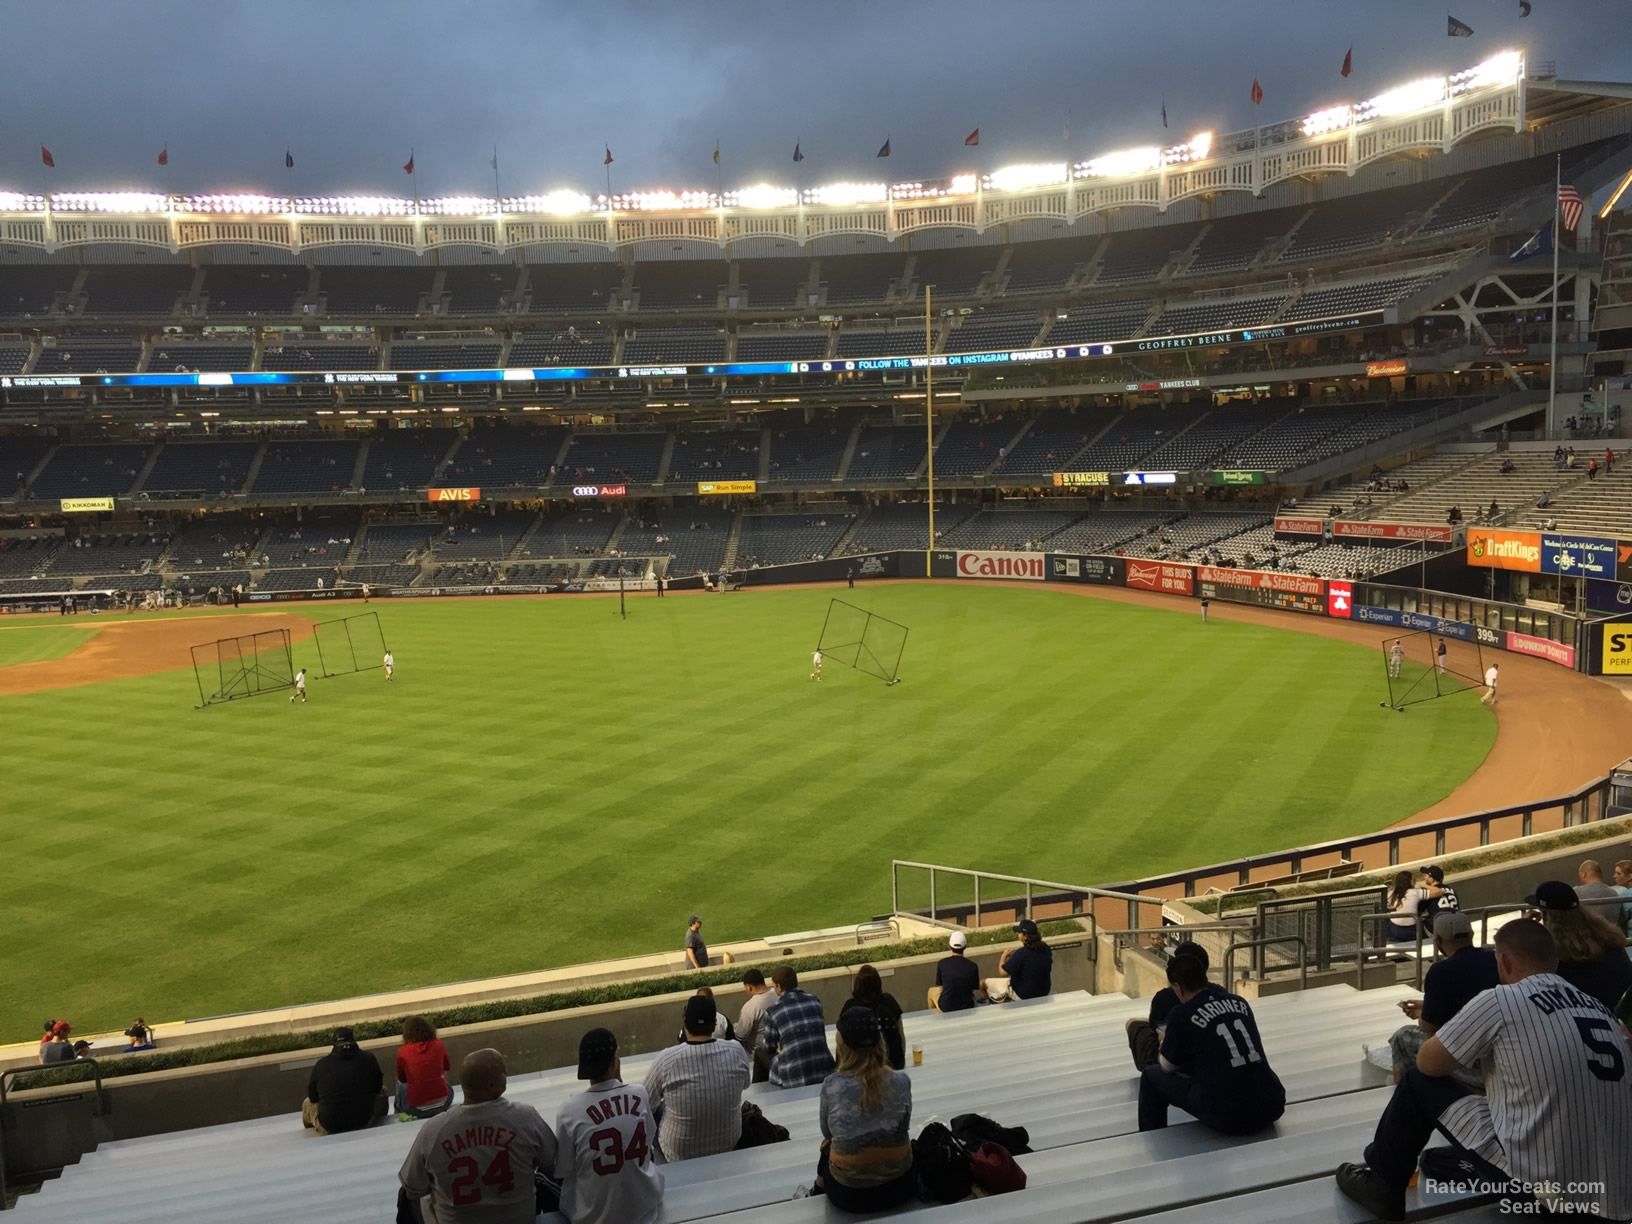 Yankee Stadium Section 203 - New York Yankees - RateYourSeats.com